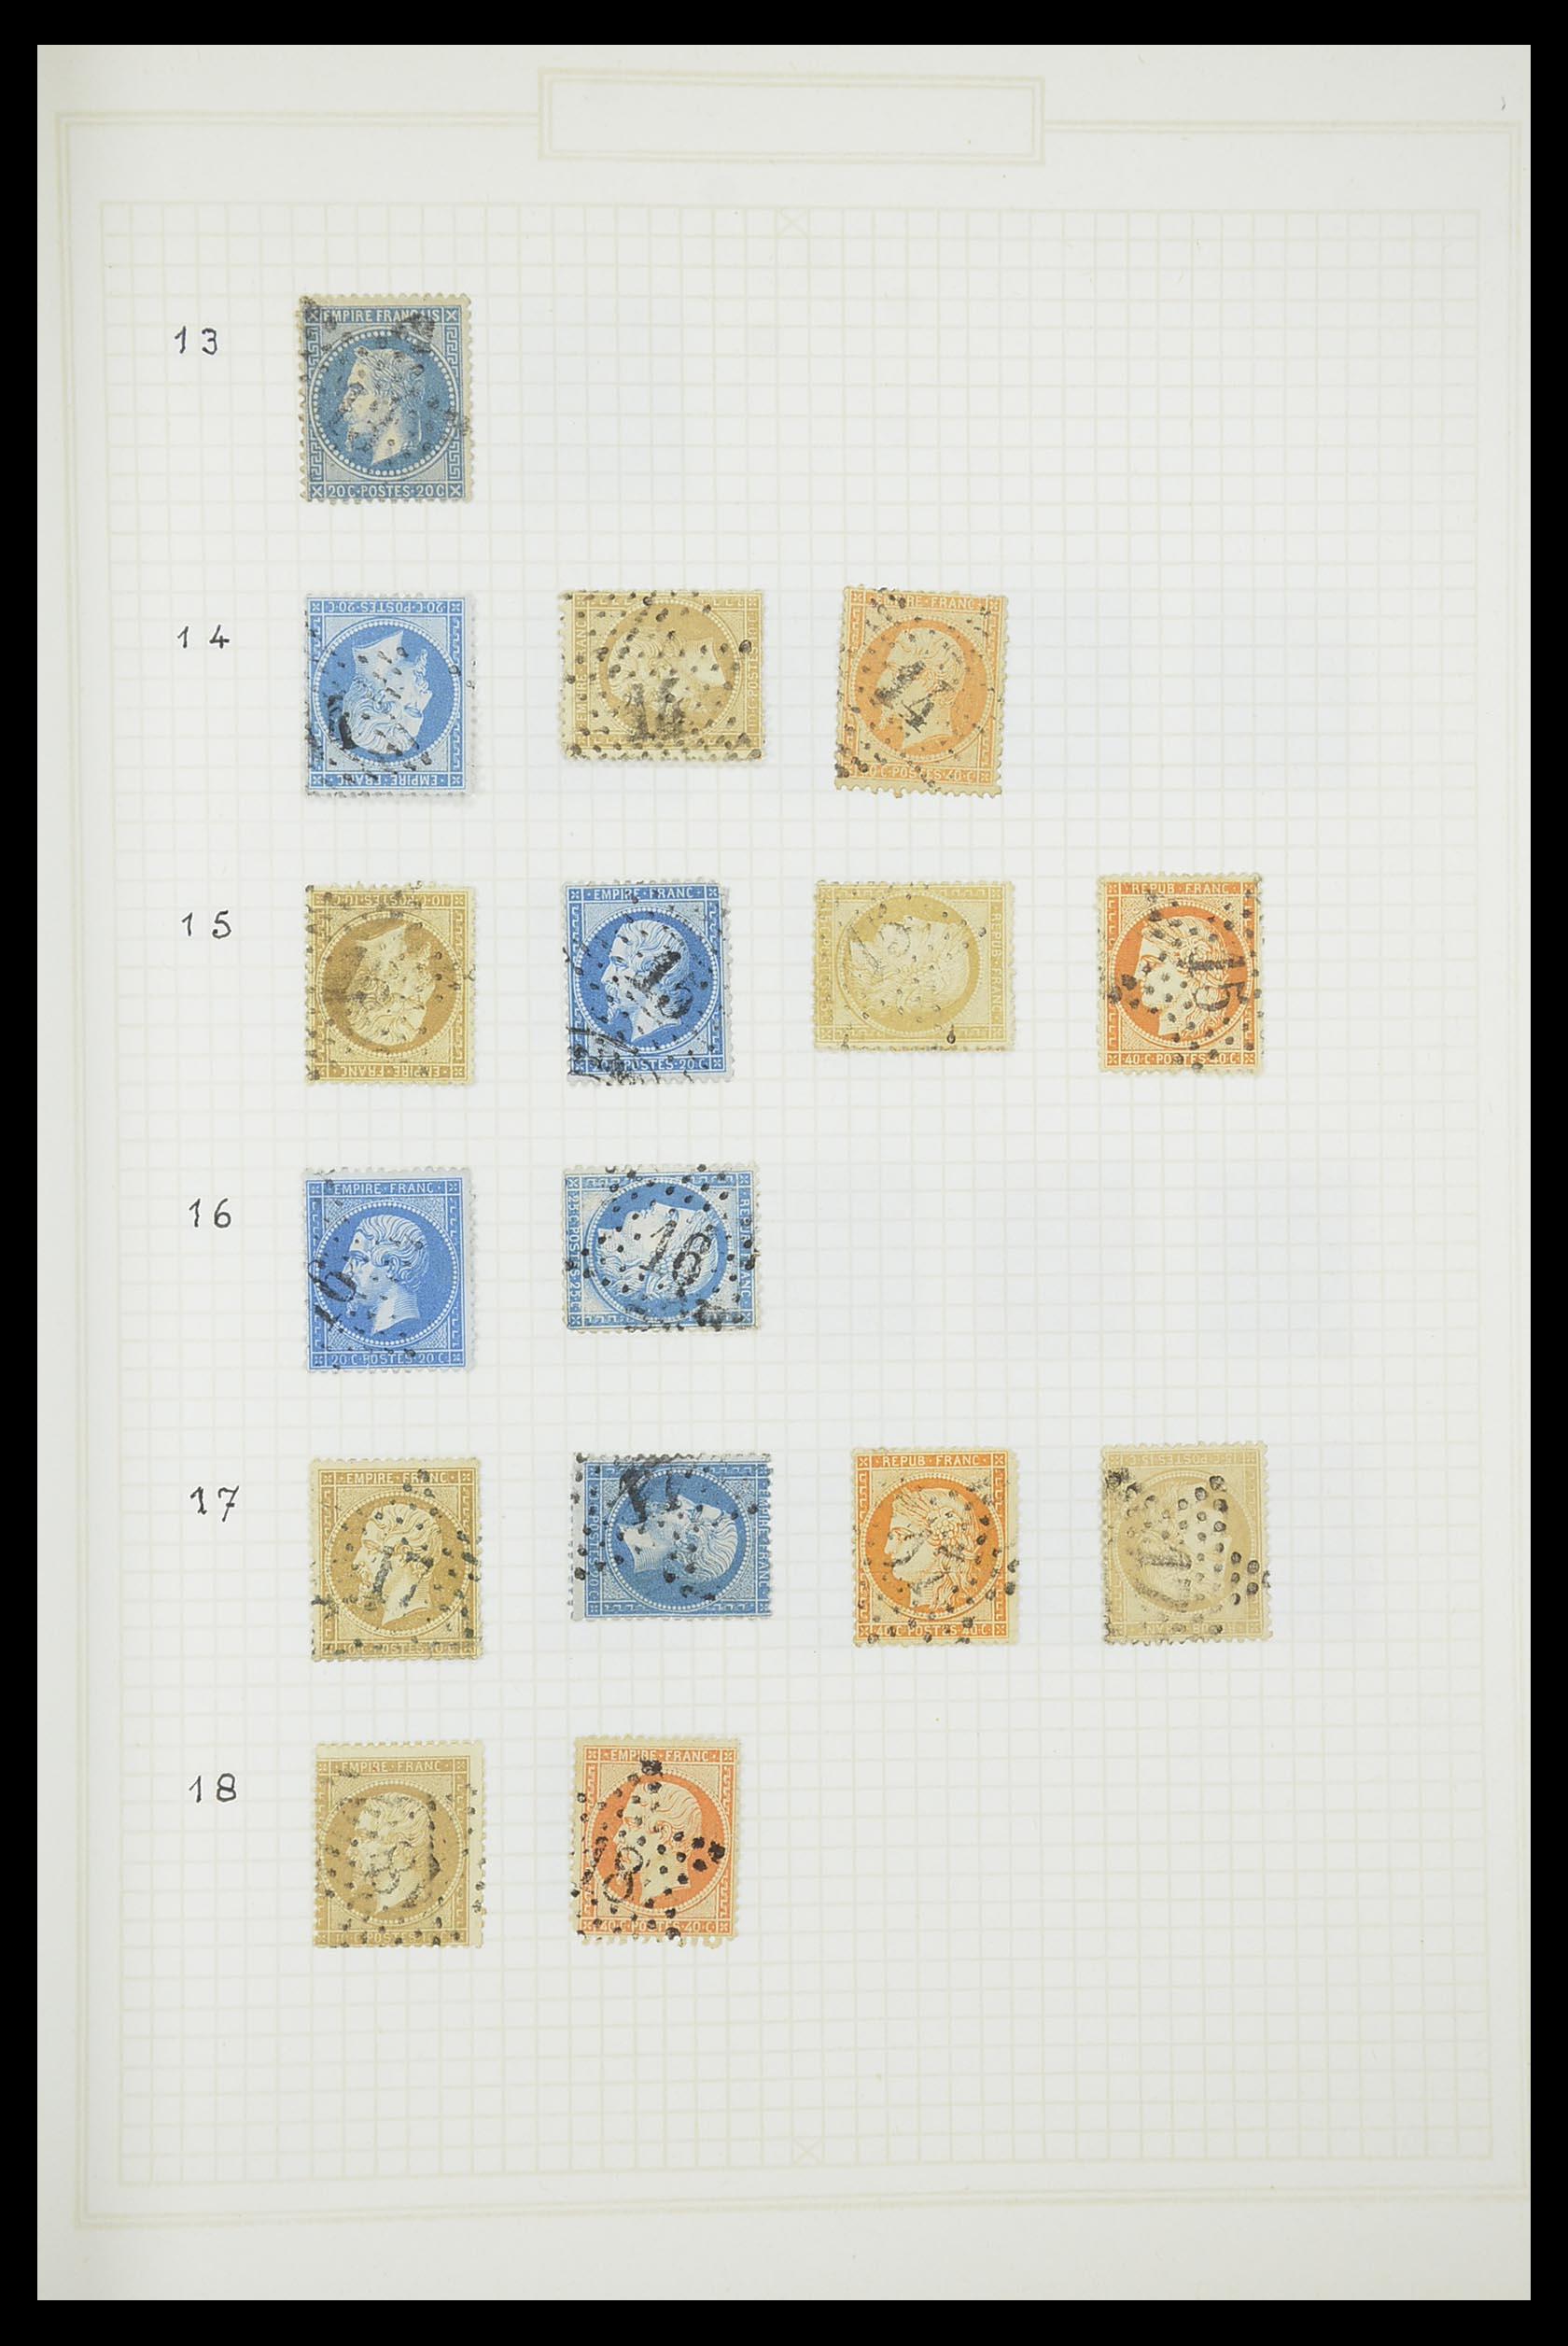 33851 004 - Postzegelverzameling 33851 Frankrijk klassiek stempels.